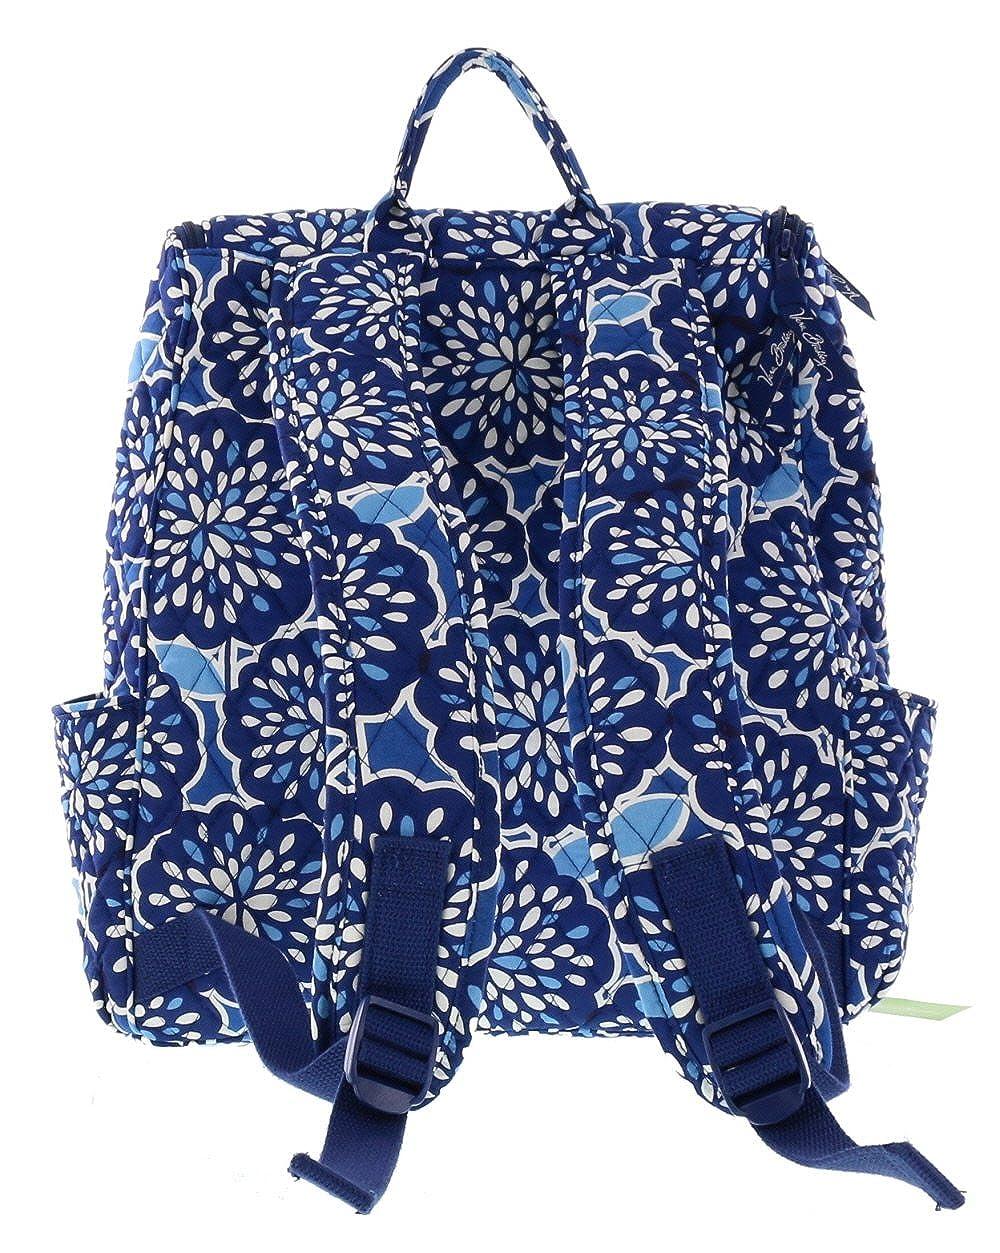 e6918a6ccf8 Vera Bradley Double Zip Backpack in Petal Splash  Amazon.co.uk  Shoes   Bags